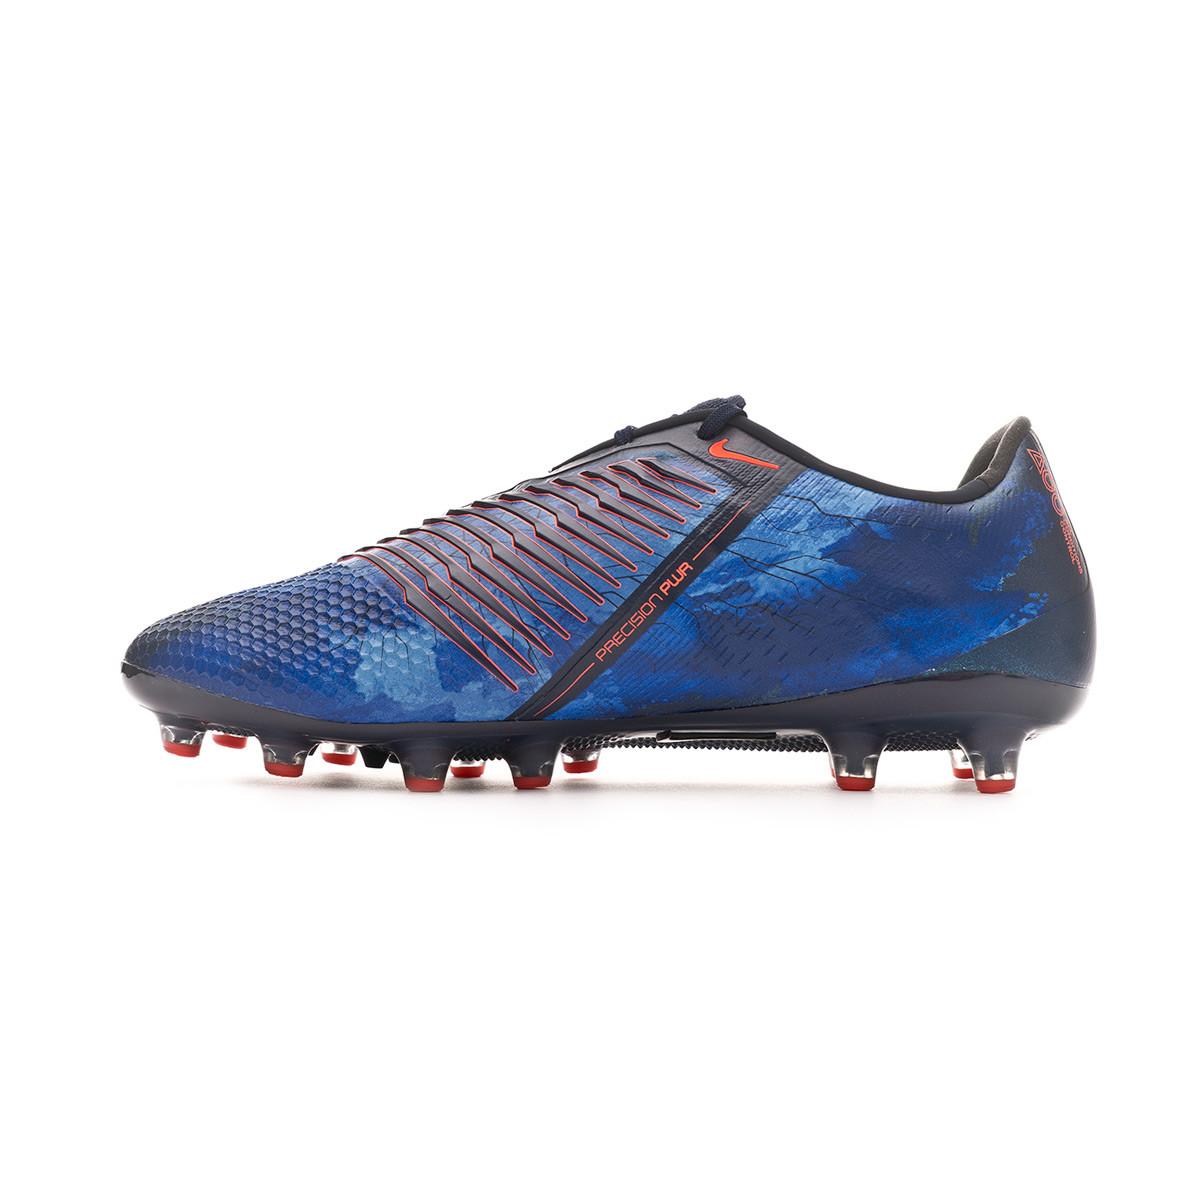 b4f295ad3c7 Football Boots Nike Phantom Venom Elite AG-Pro Obsidian-White-Black-Racer  blue - Football store Fútbol Emotion